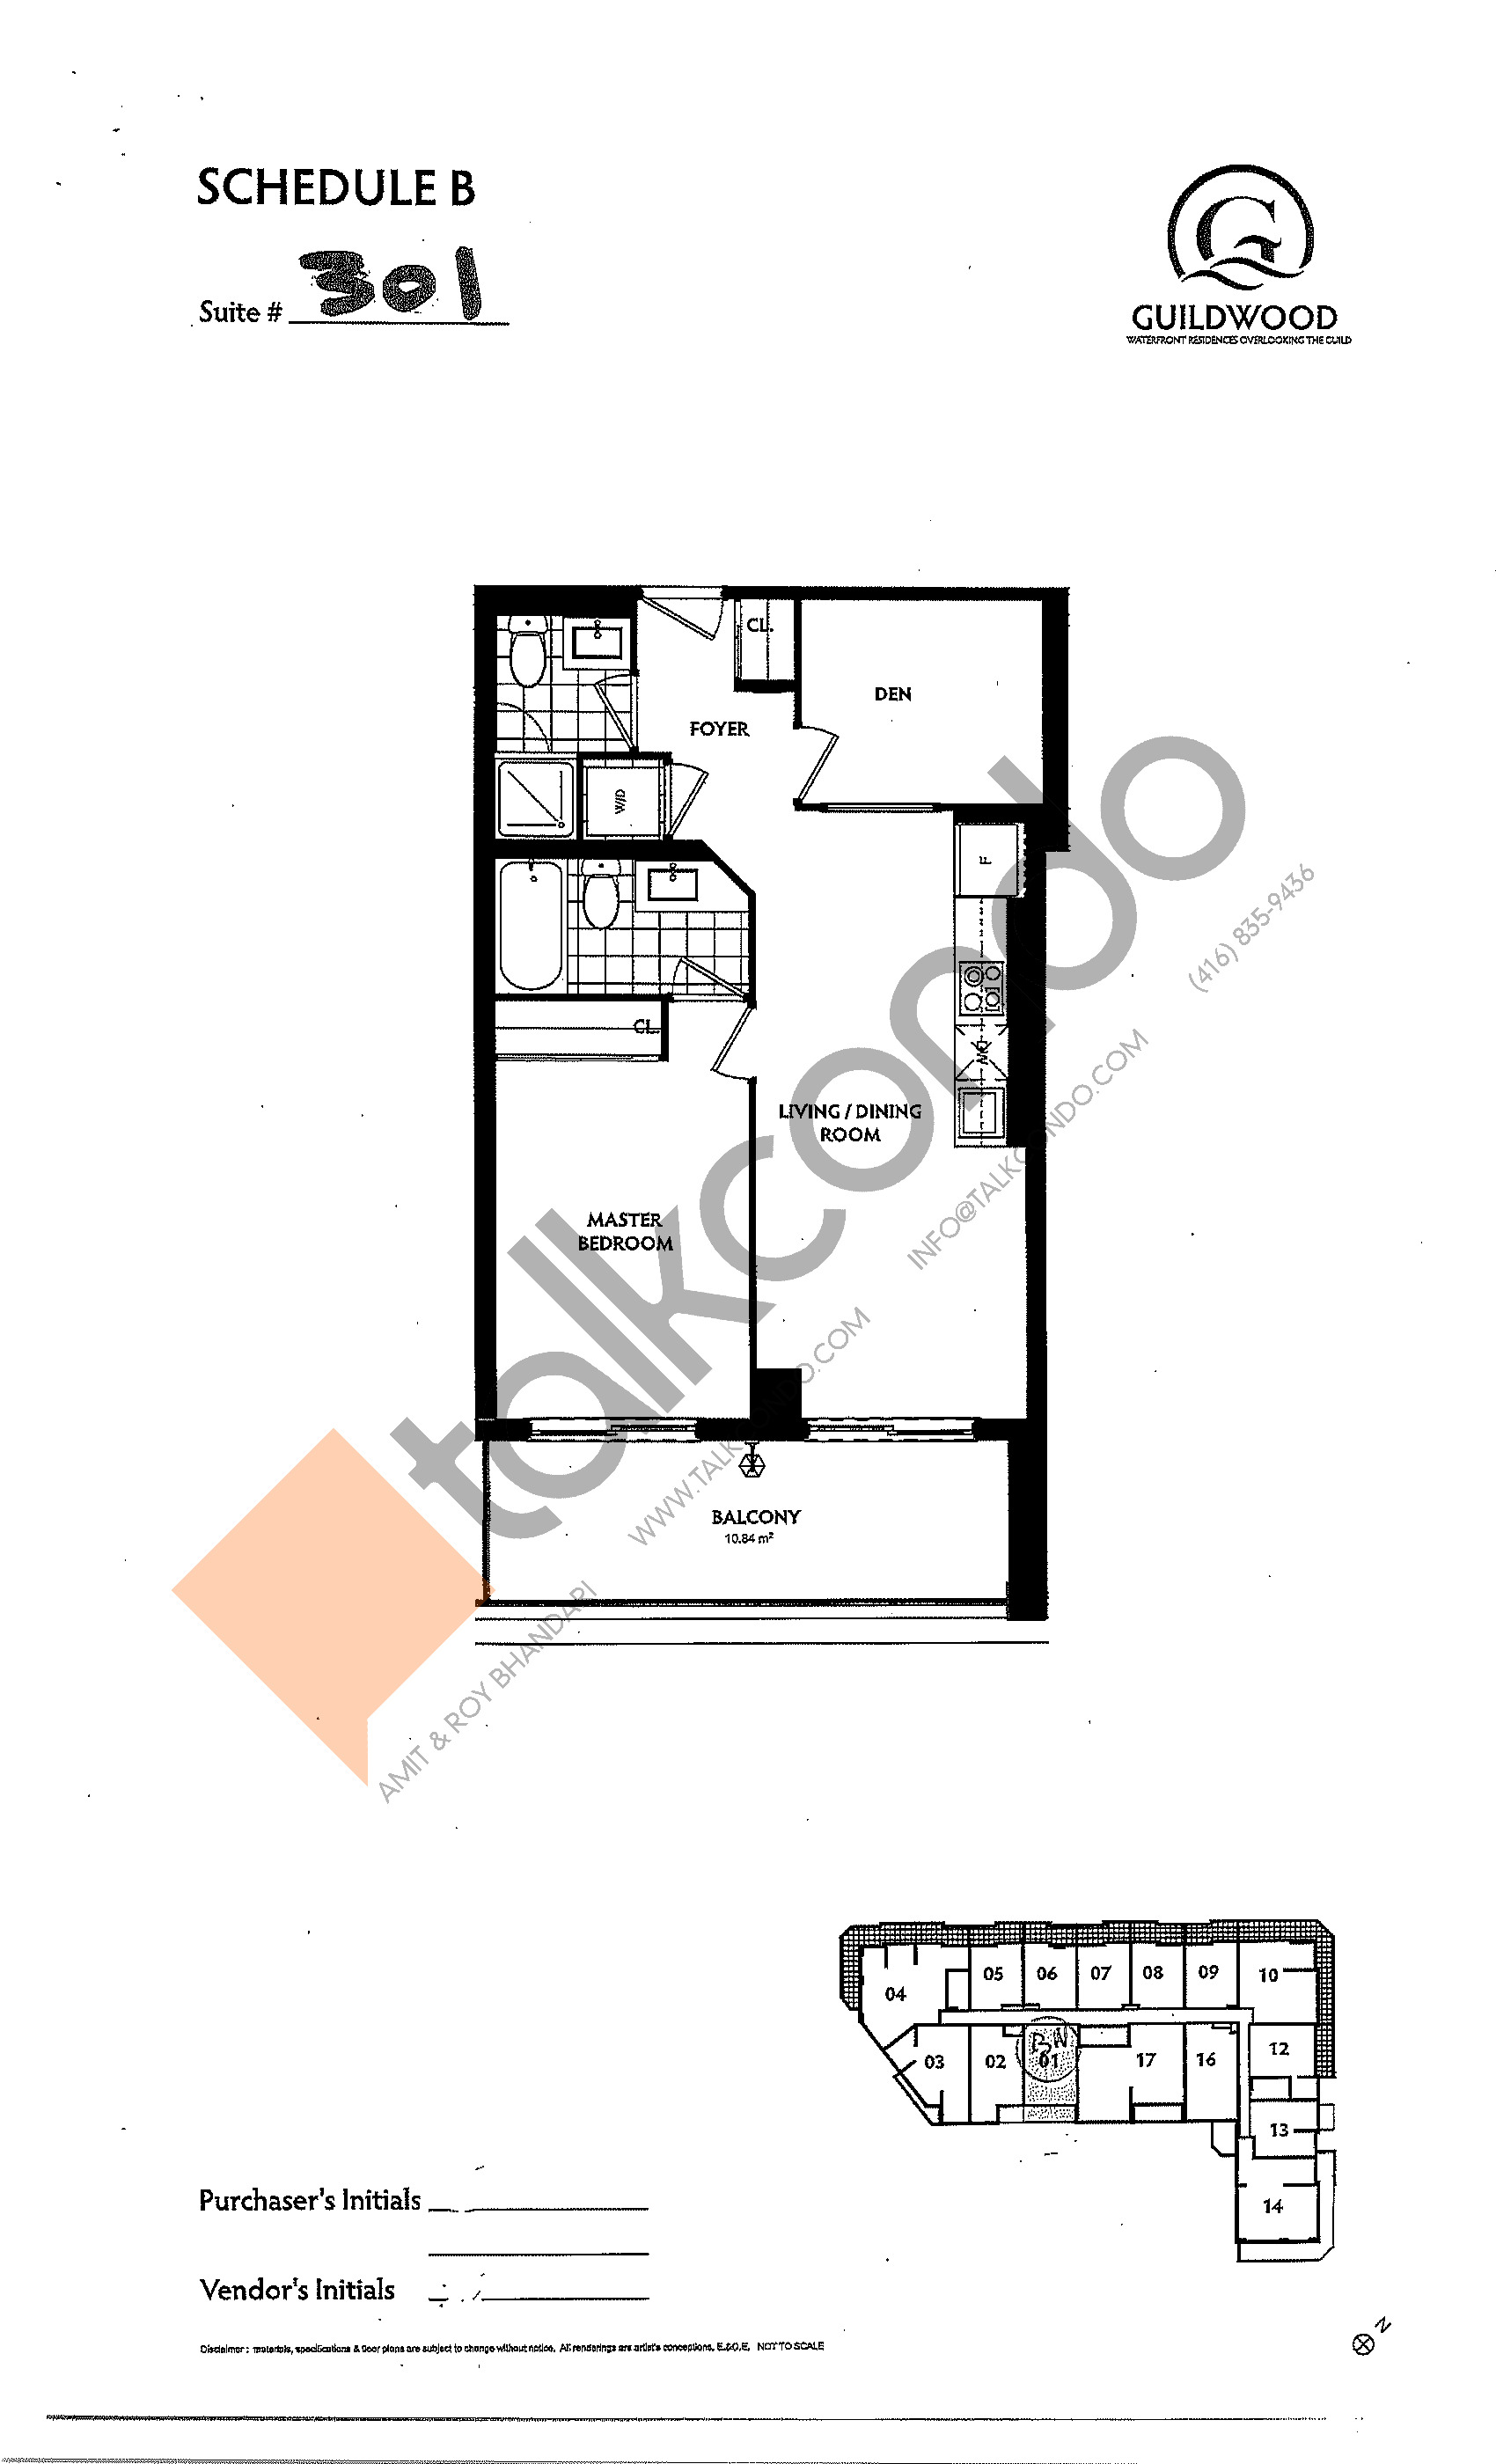 Suite 301 Floor Plan at Guildwood Condos - 646 sq.ft